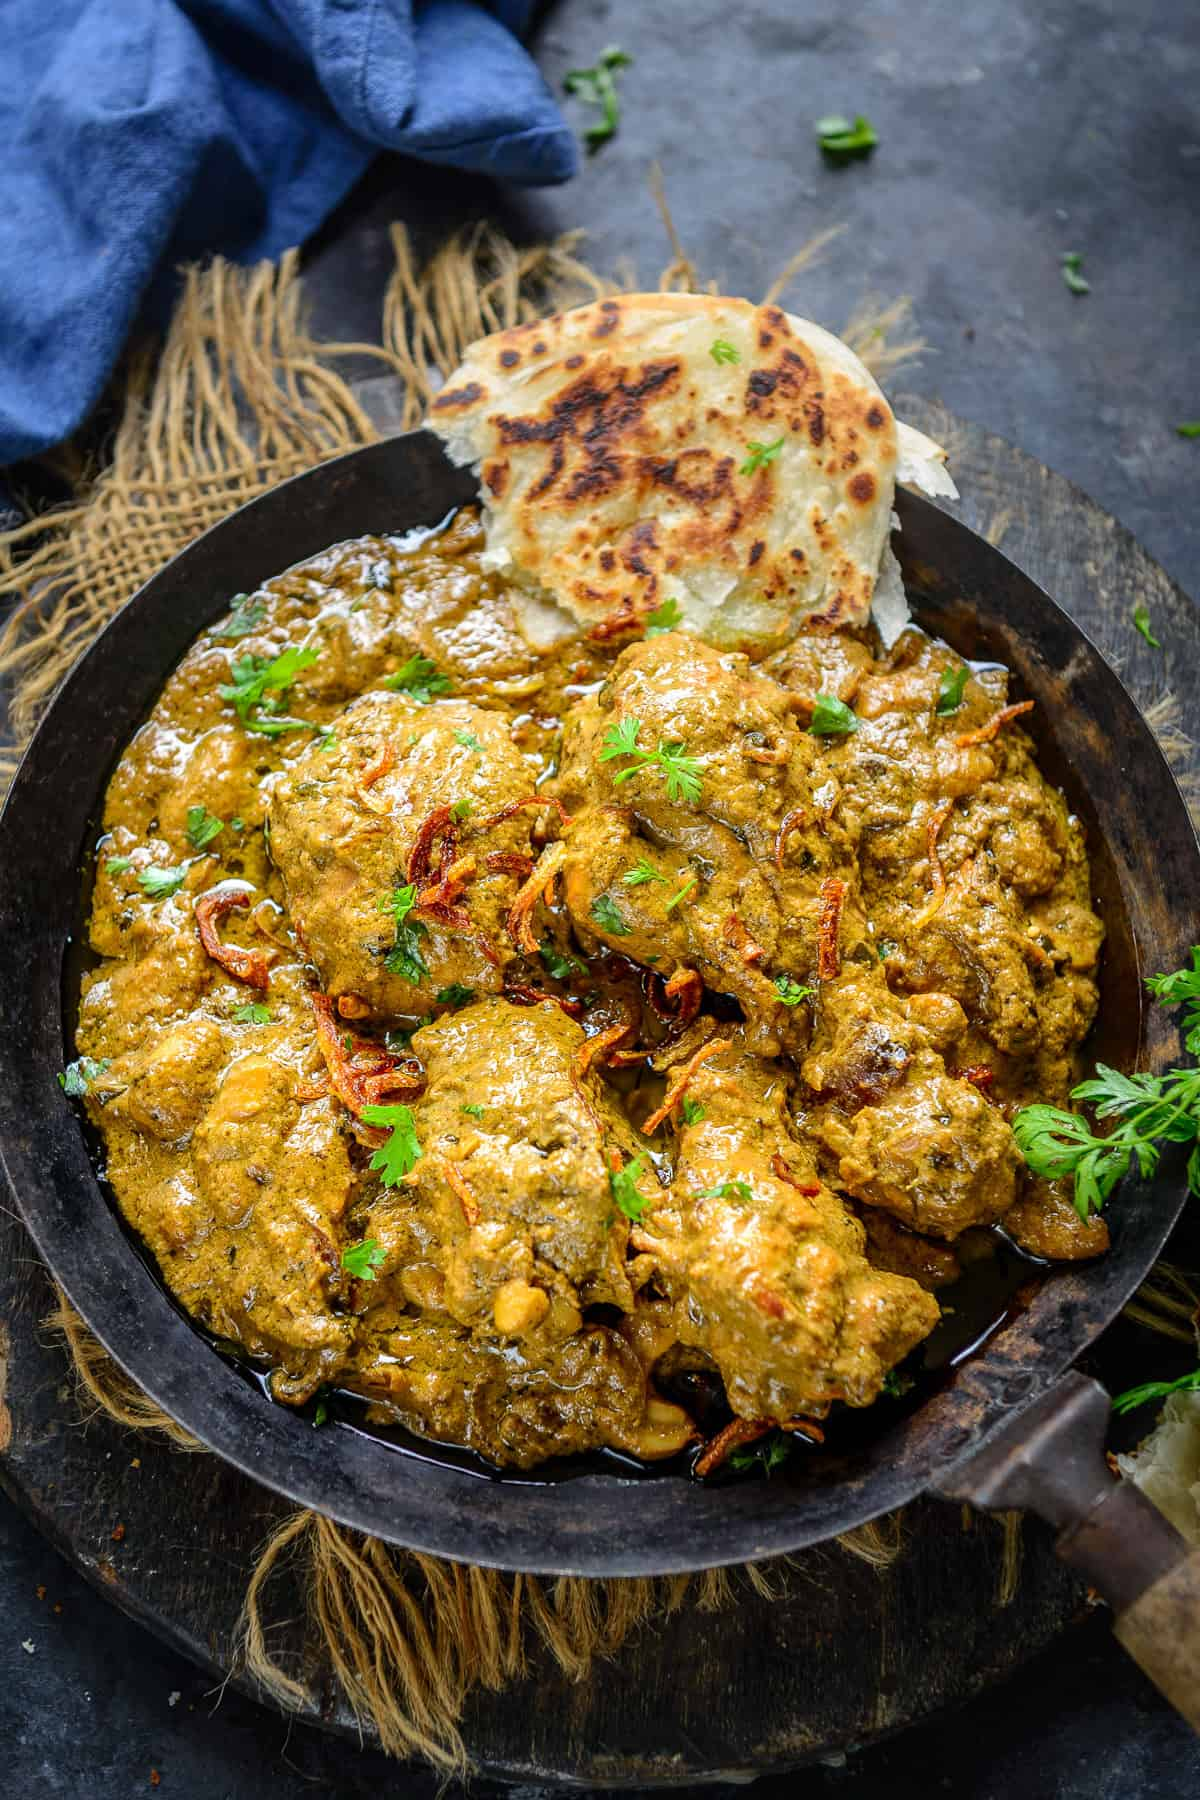 Coriander chicken curry served in a bowl.